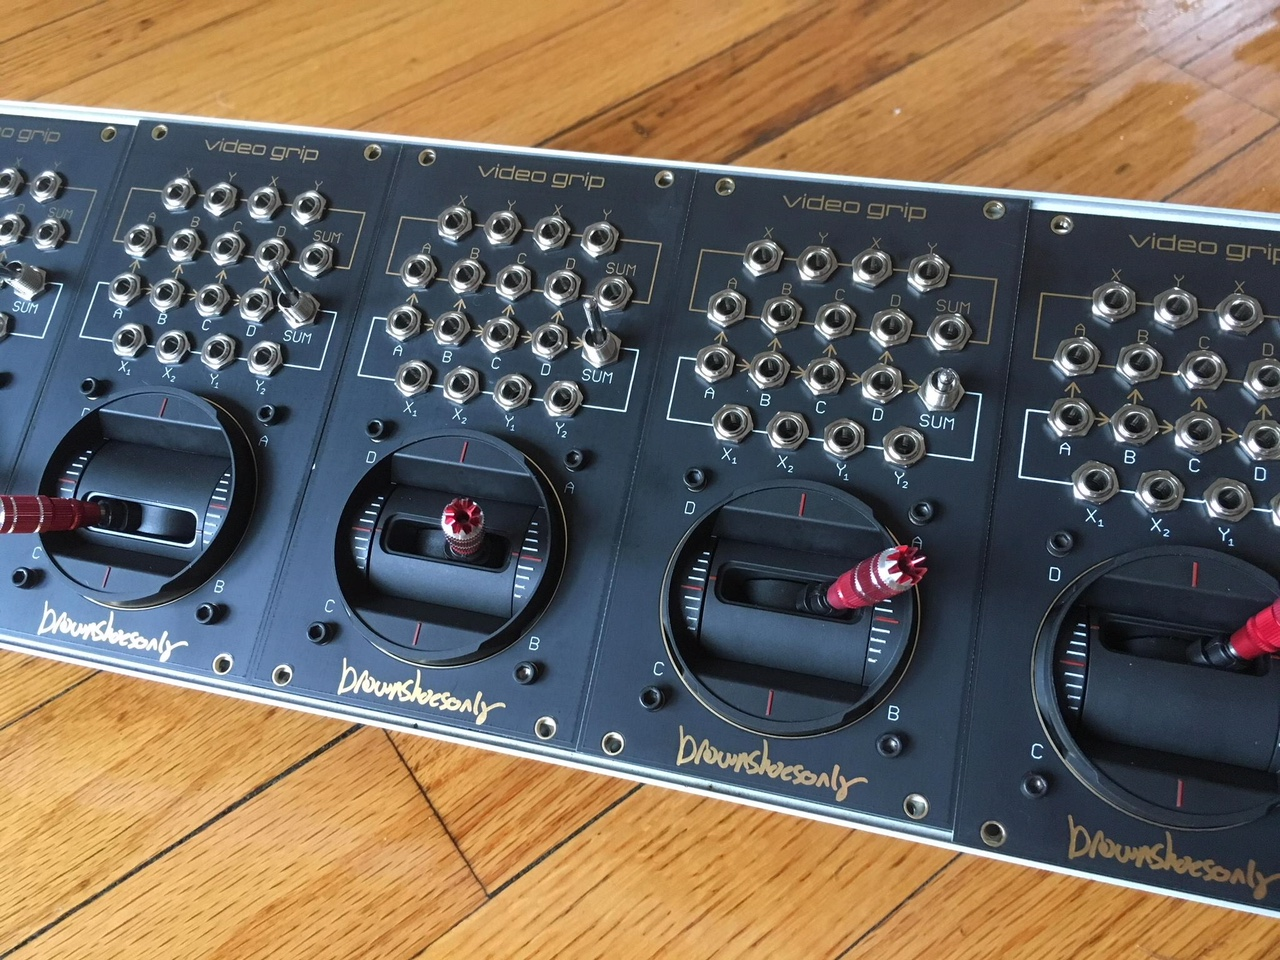 video grip - complex video rate joystick